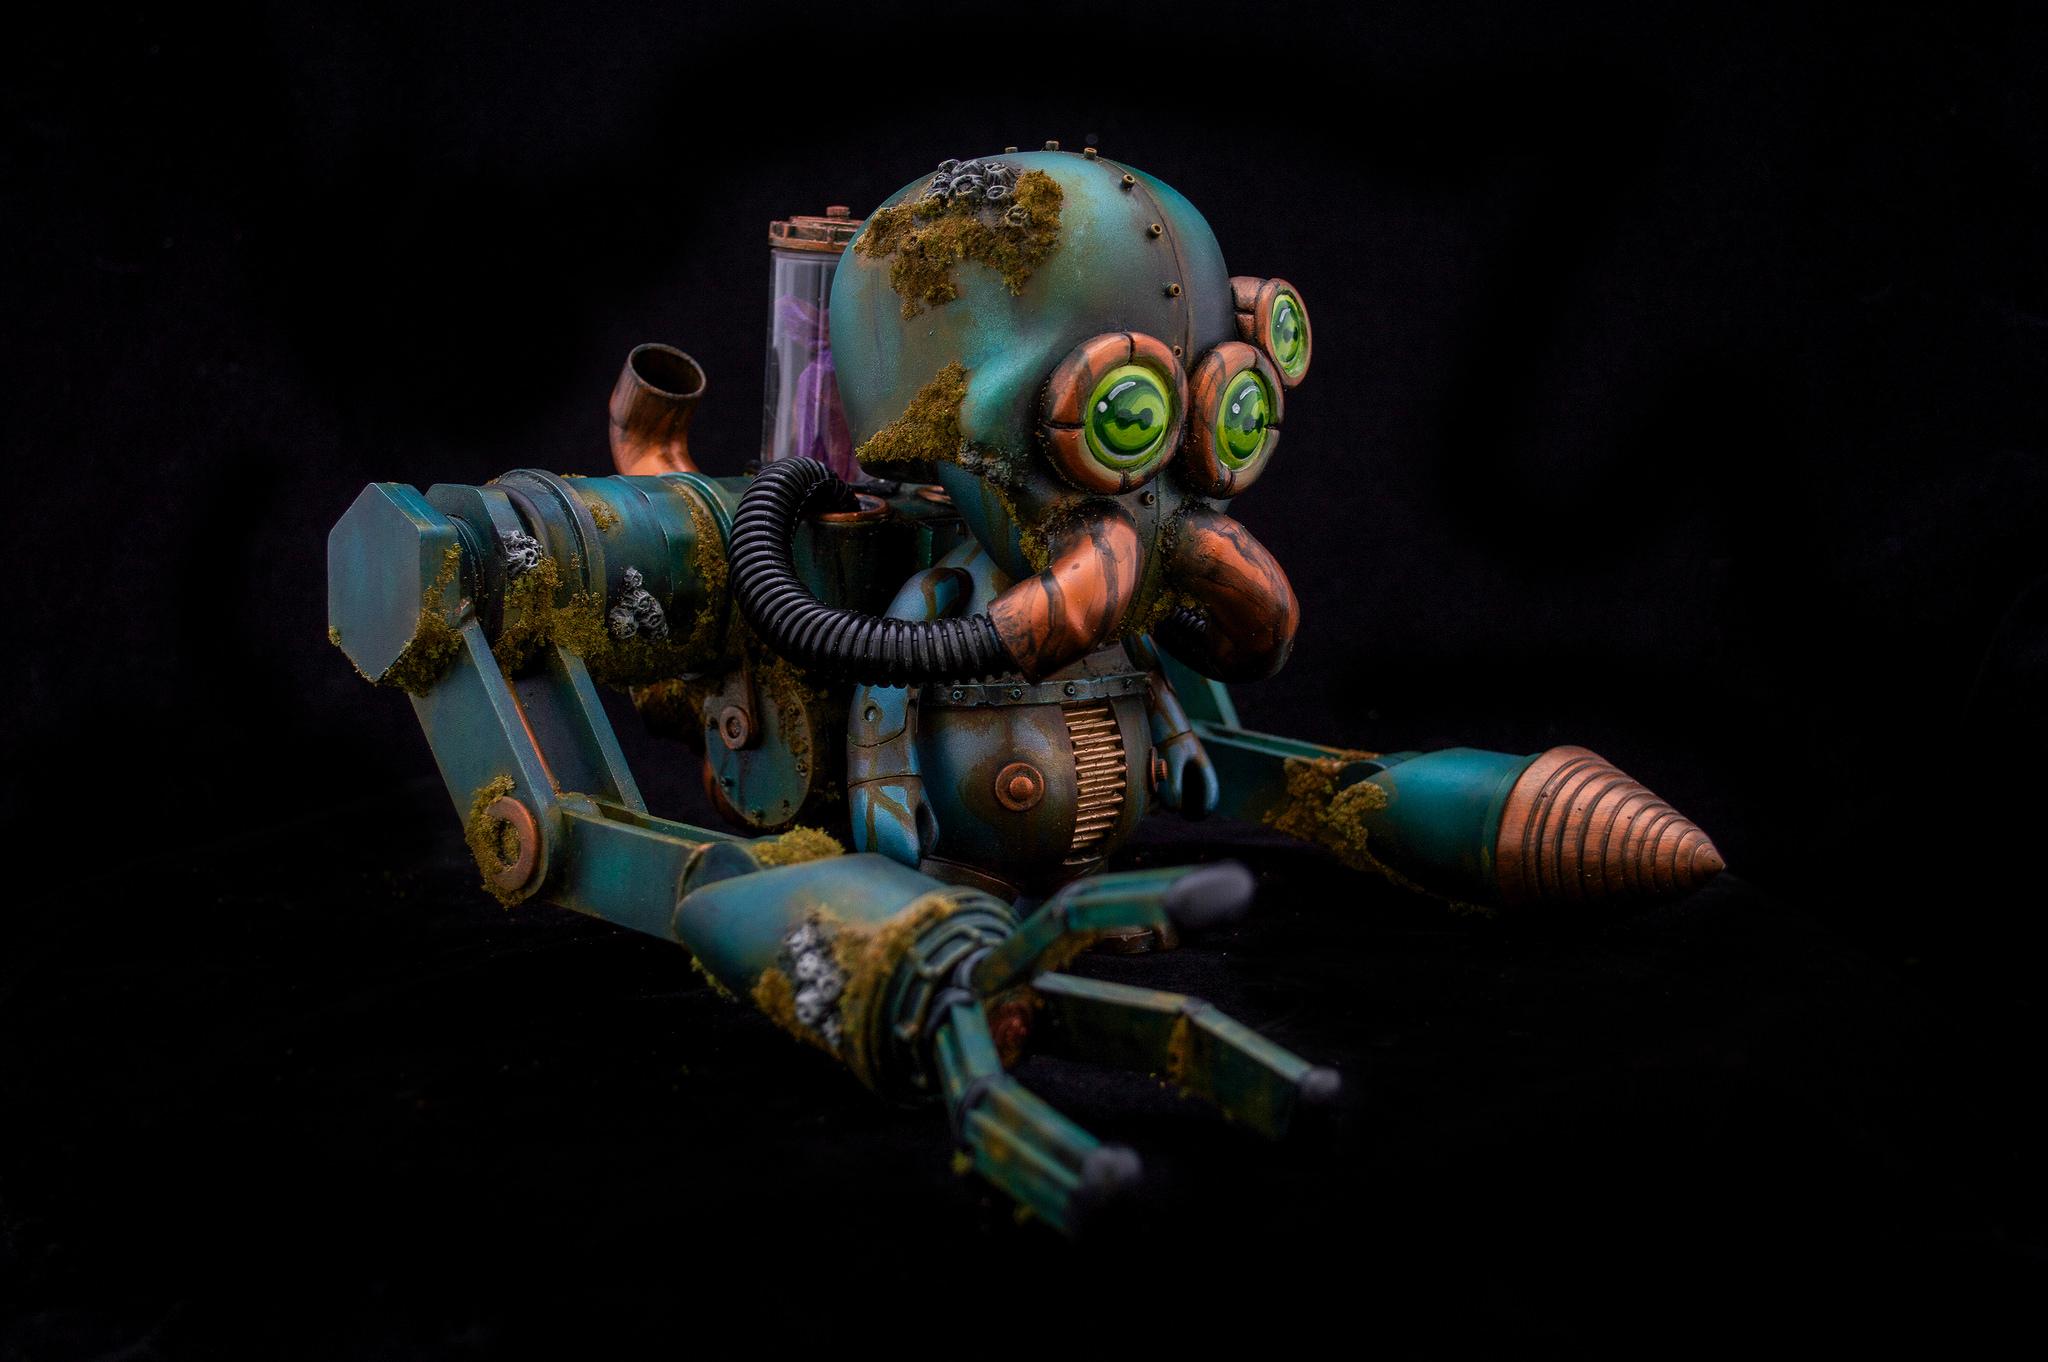 KRKN Automaton Undersea Excavator josh pearce fplus